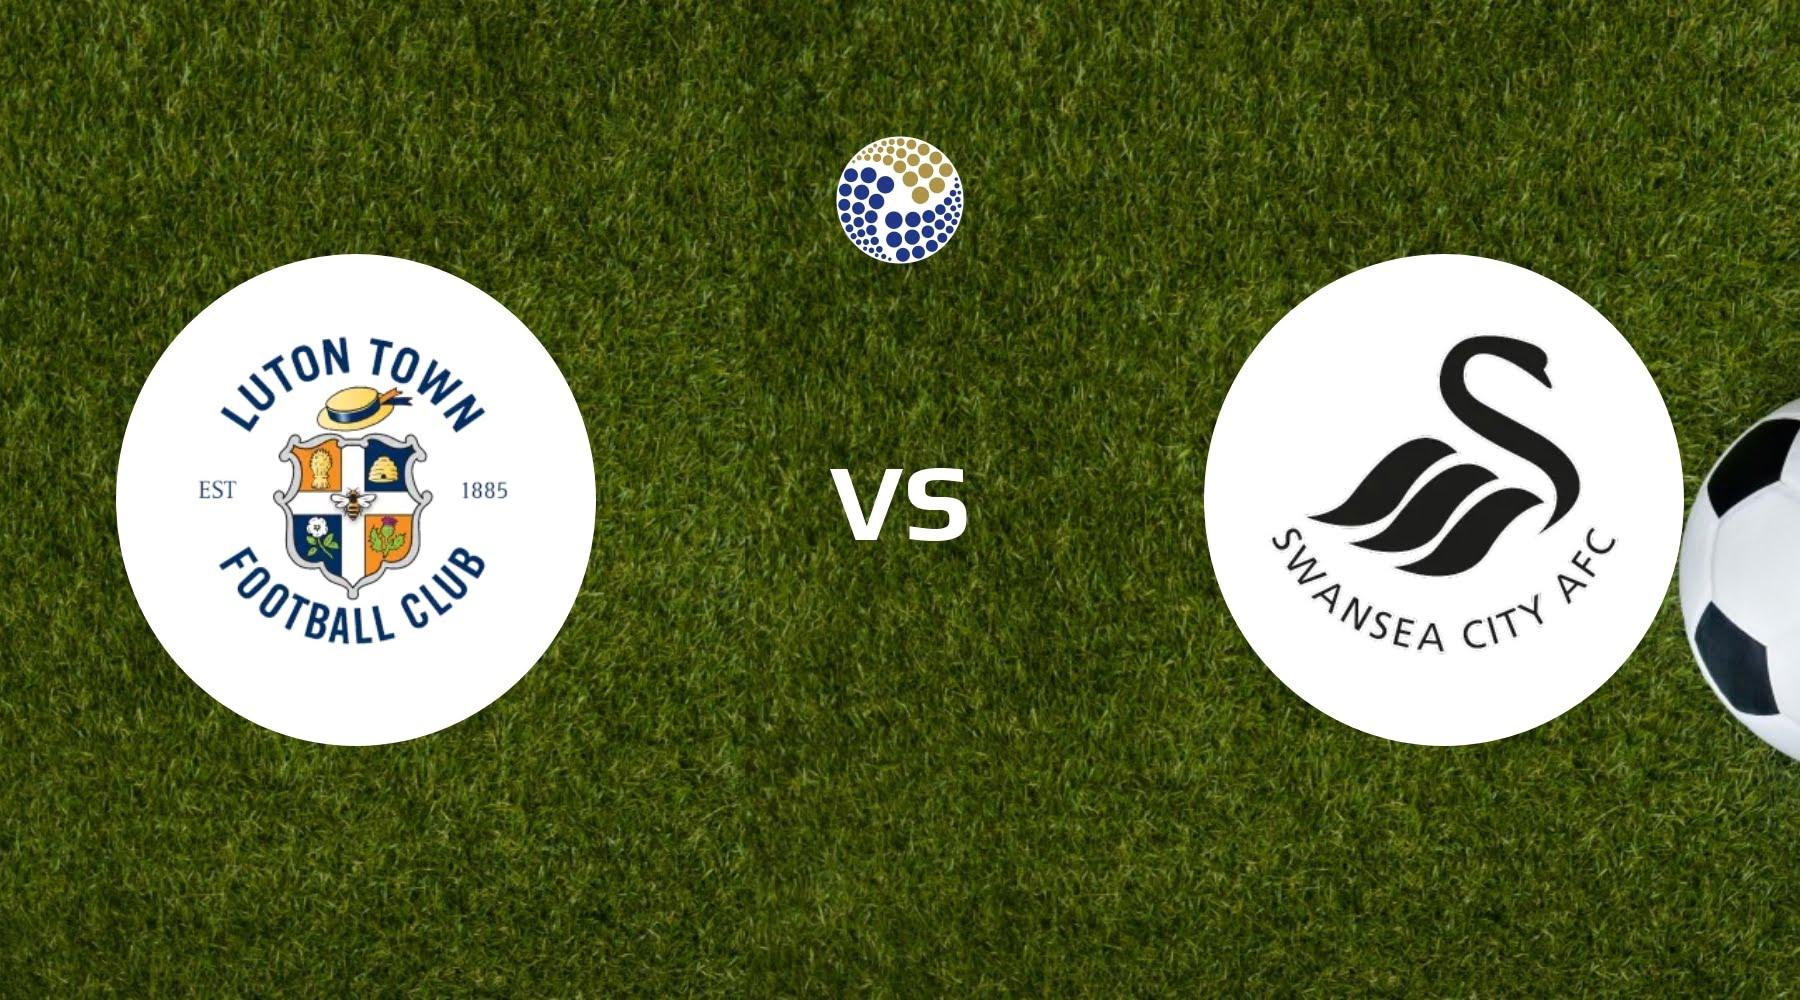 Luton Town vs Swansea City Betting